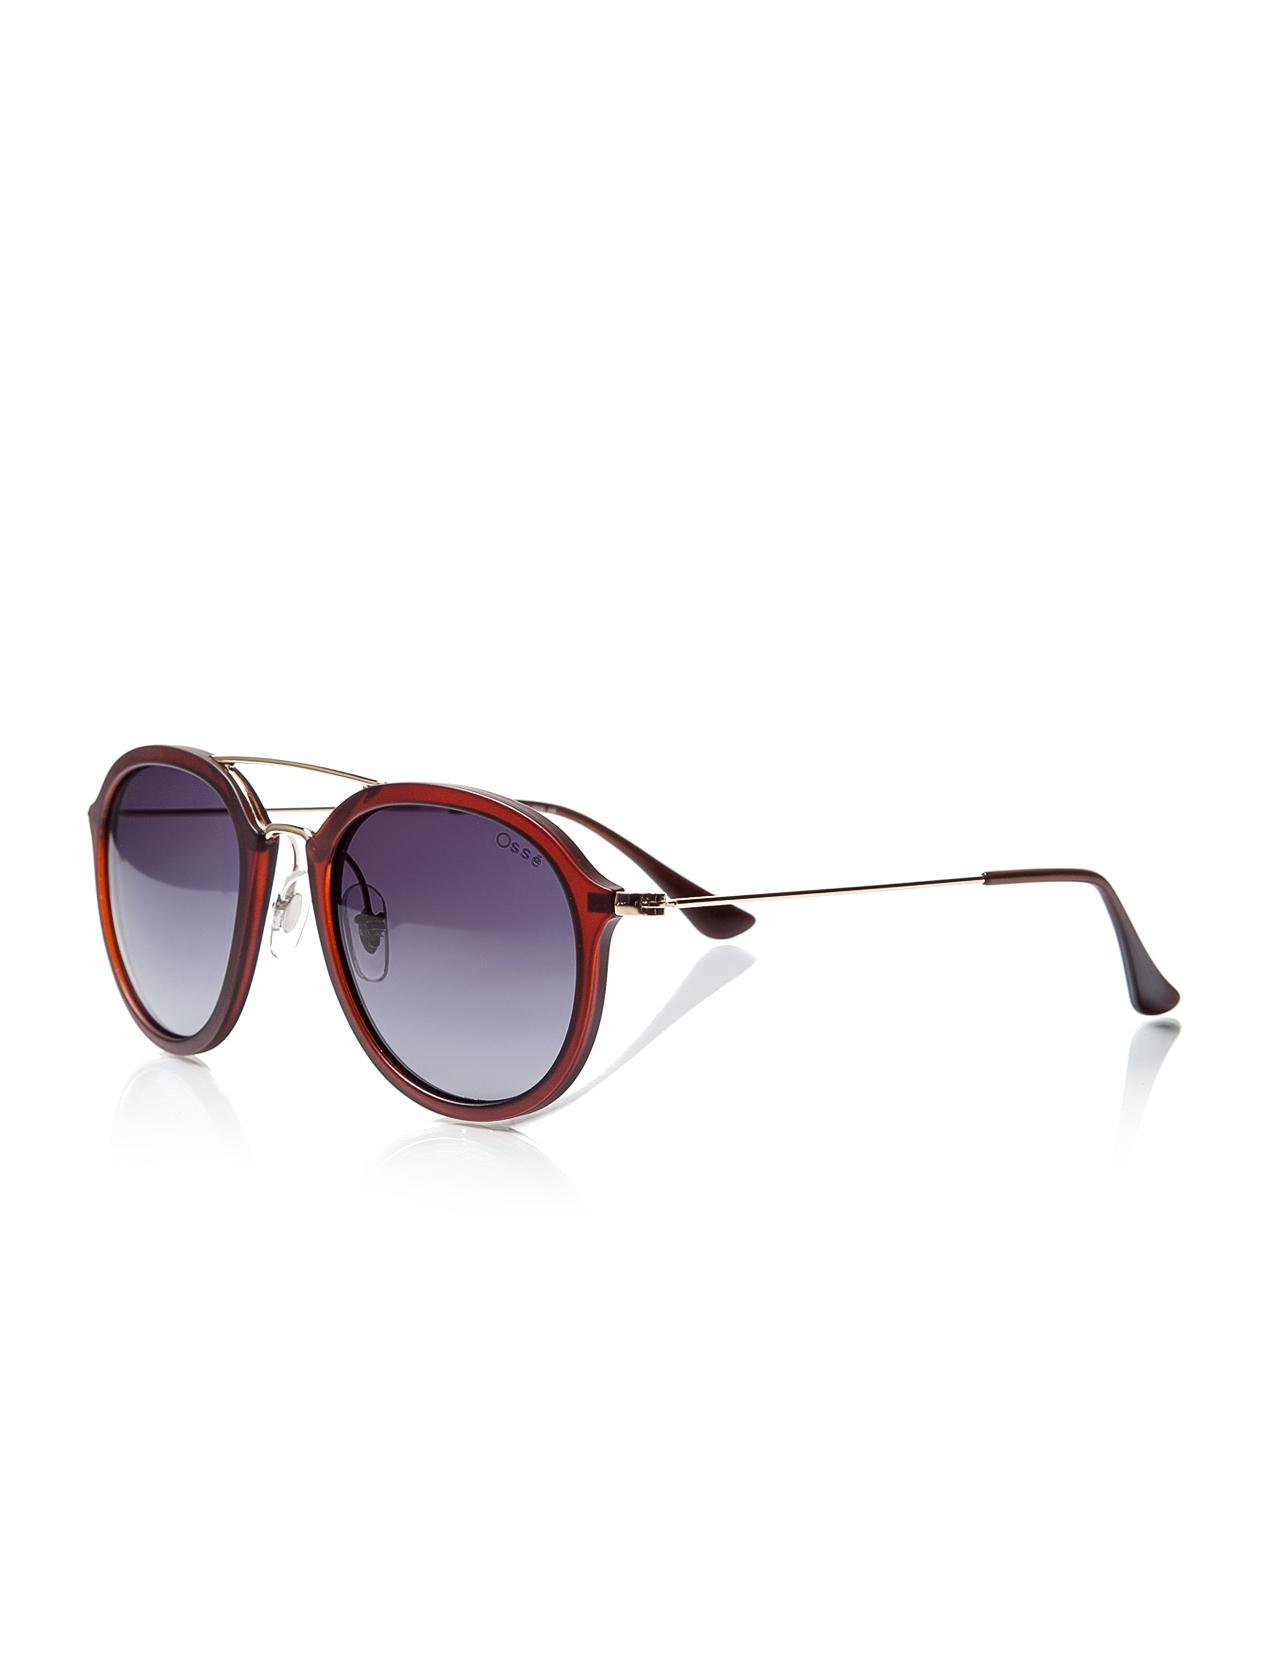 Men's New Trendy Sunglasses